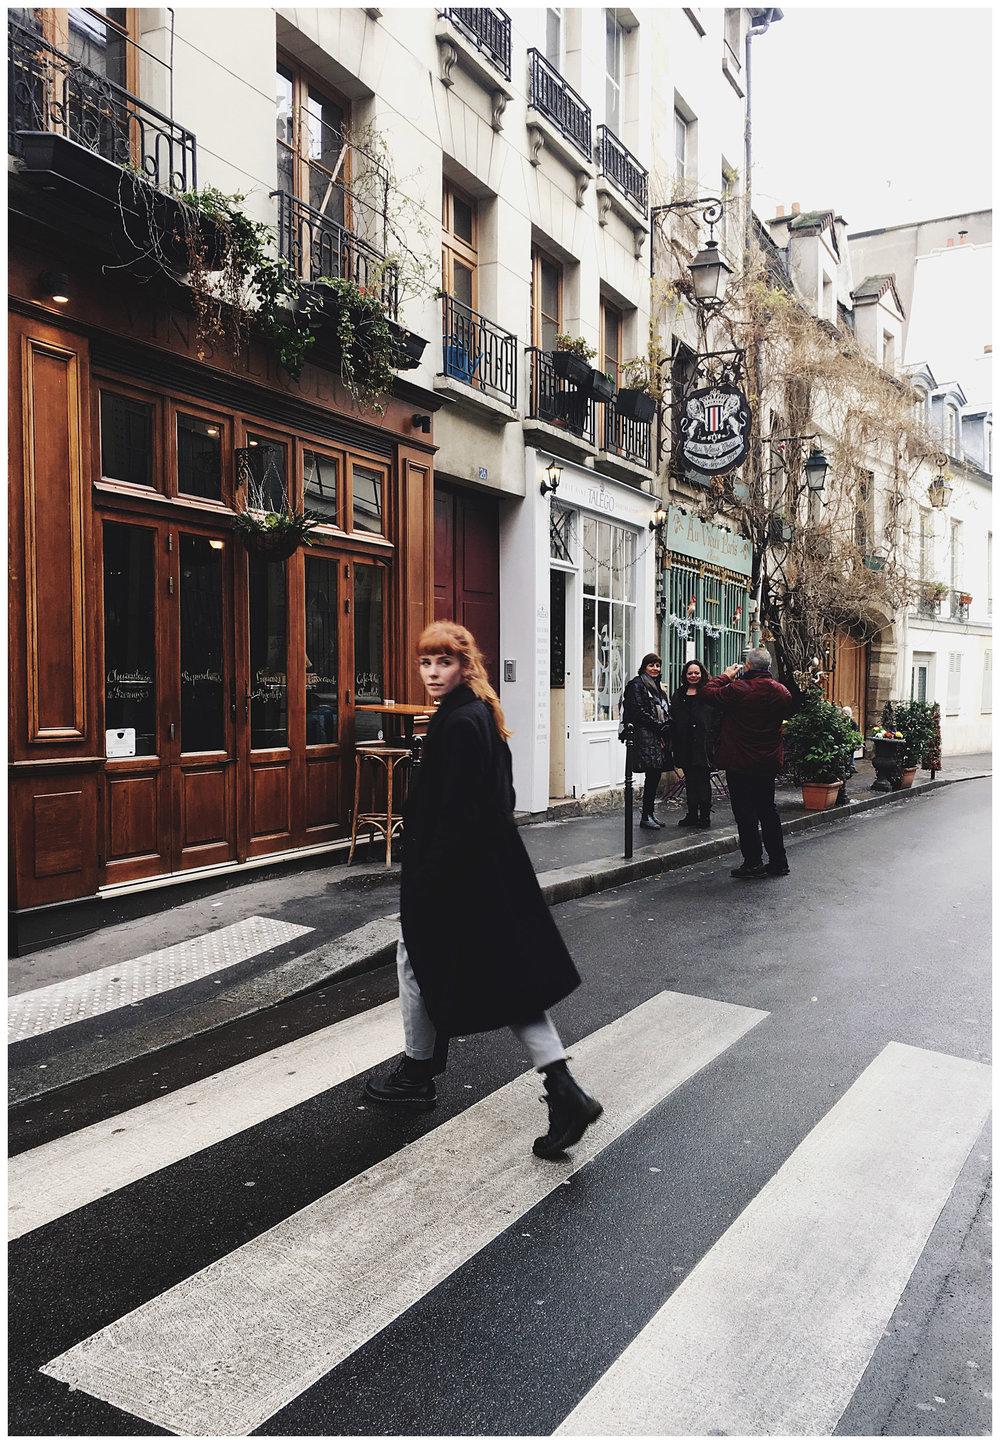 paris-reise-tagebuch-travelguide_4